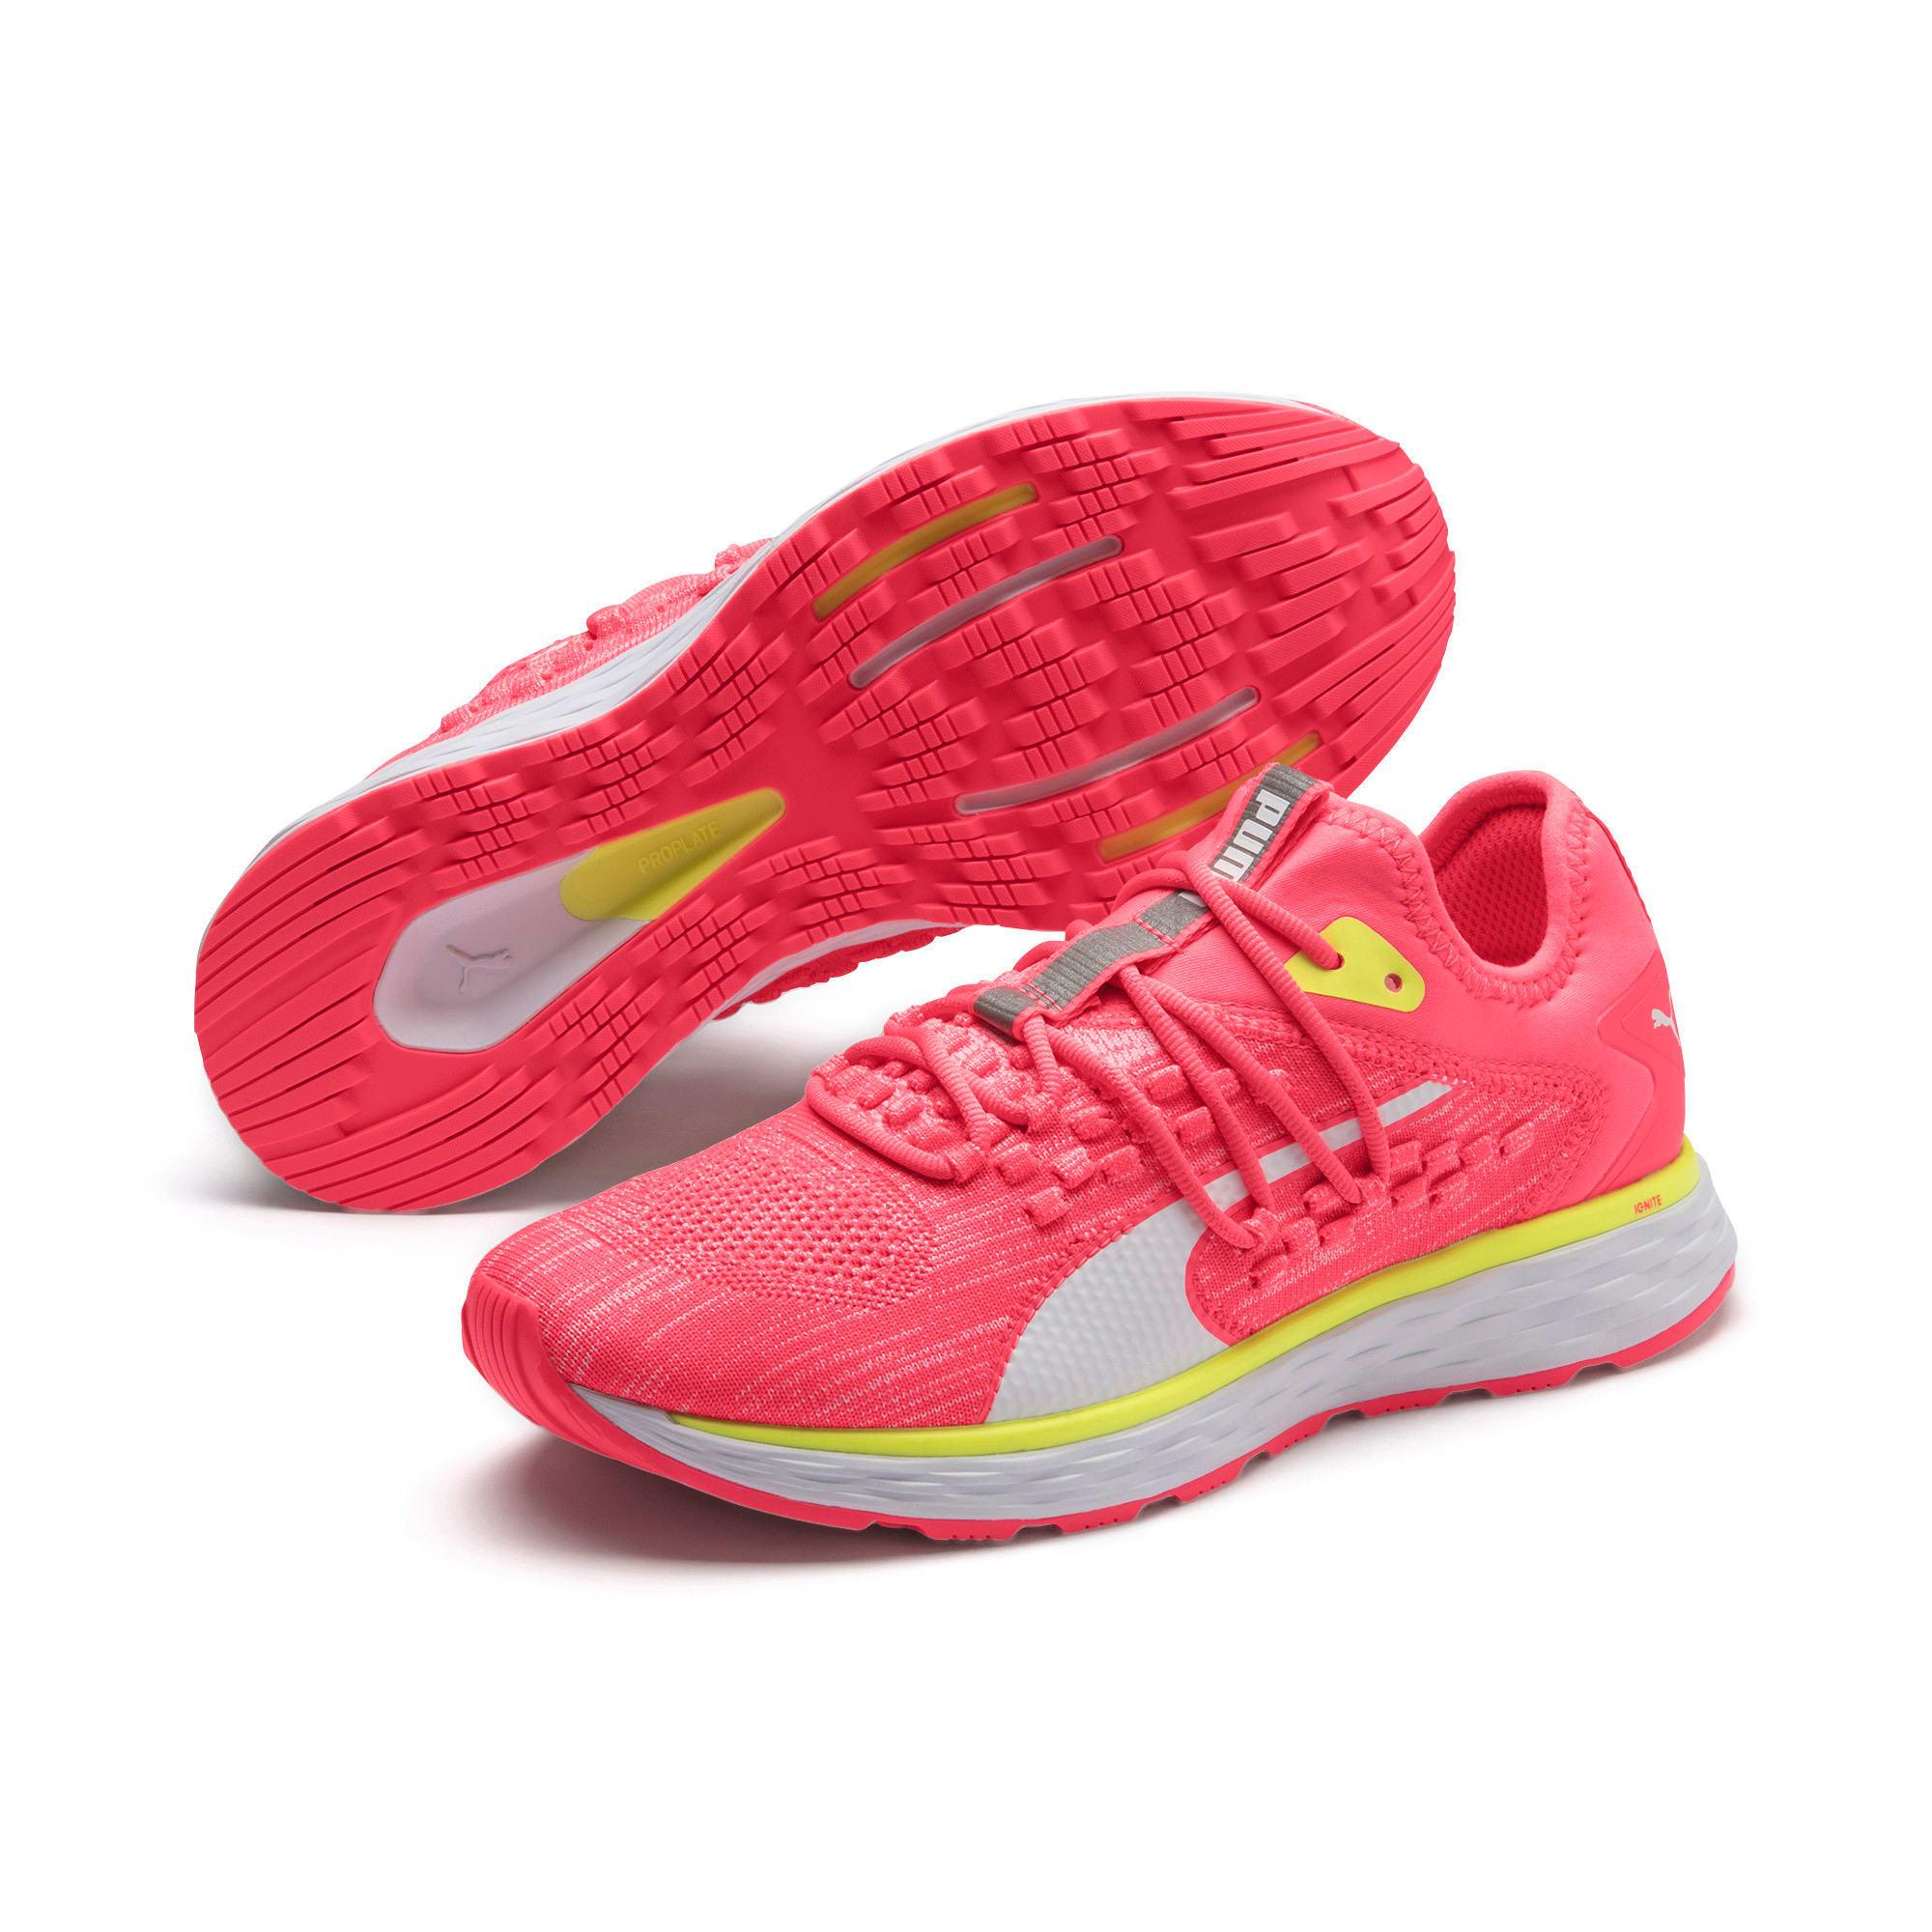 Thumbnail 3 of SPEED FUSEFIT Women's Running Shoes, Pink Alert-Puma White, medium